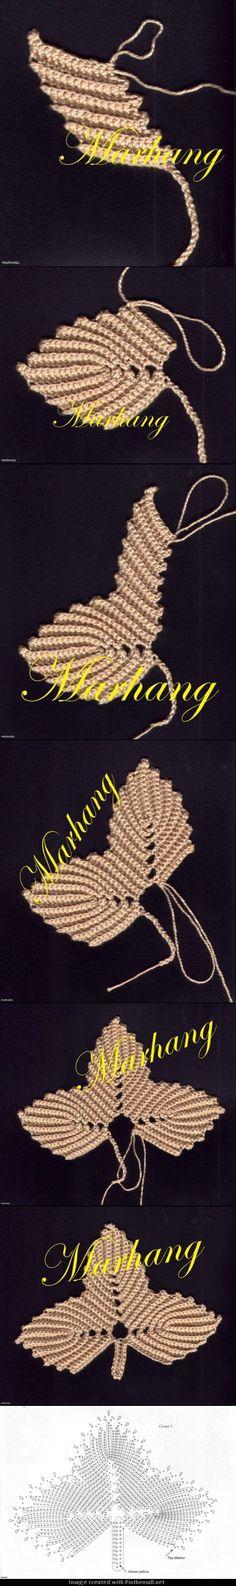 loads of brilliant leaf motifs for irish crochet Irish Crochet Patterns, Crochet Motifs, Freeform Crochet, Crochet Diagram, Crochet Designs, Knitting Patterns, Crochet Leaves, Crochet Flowers, Crochet Vintage